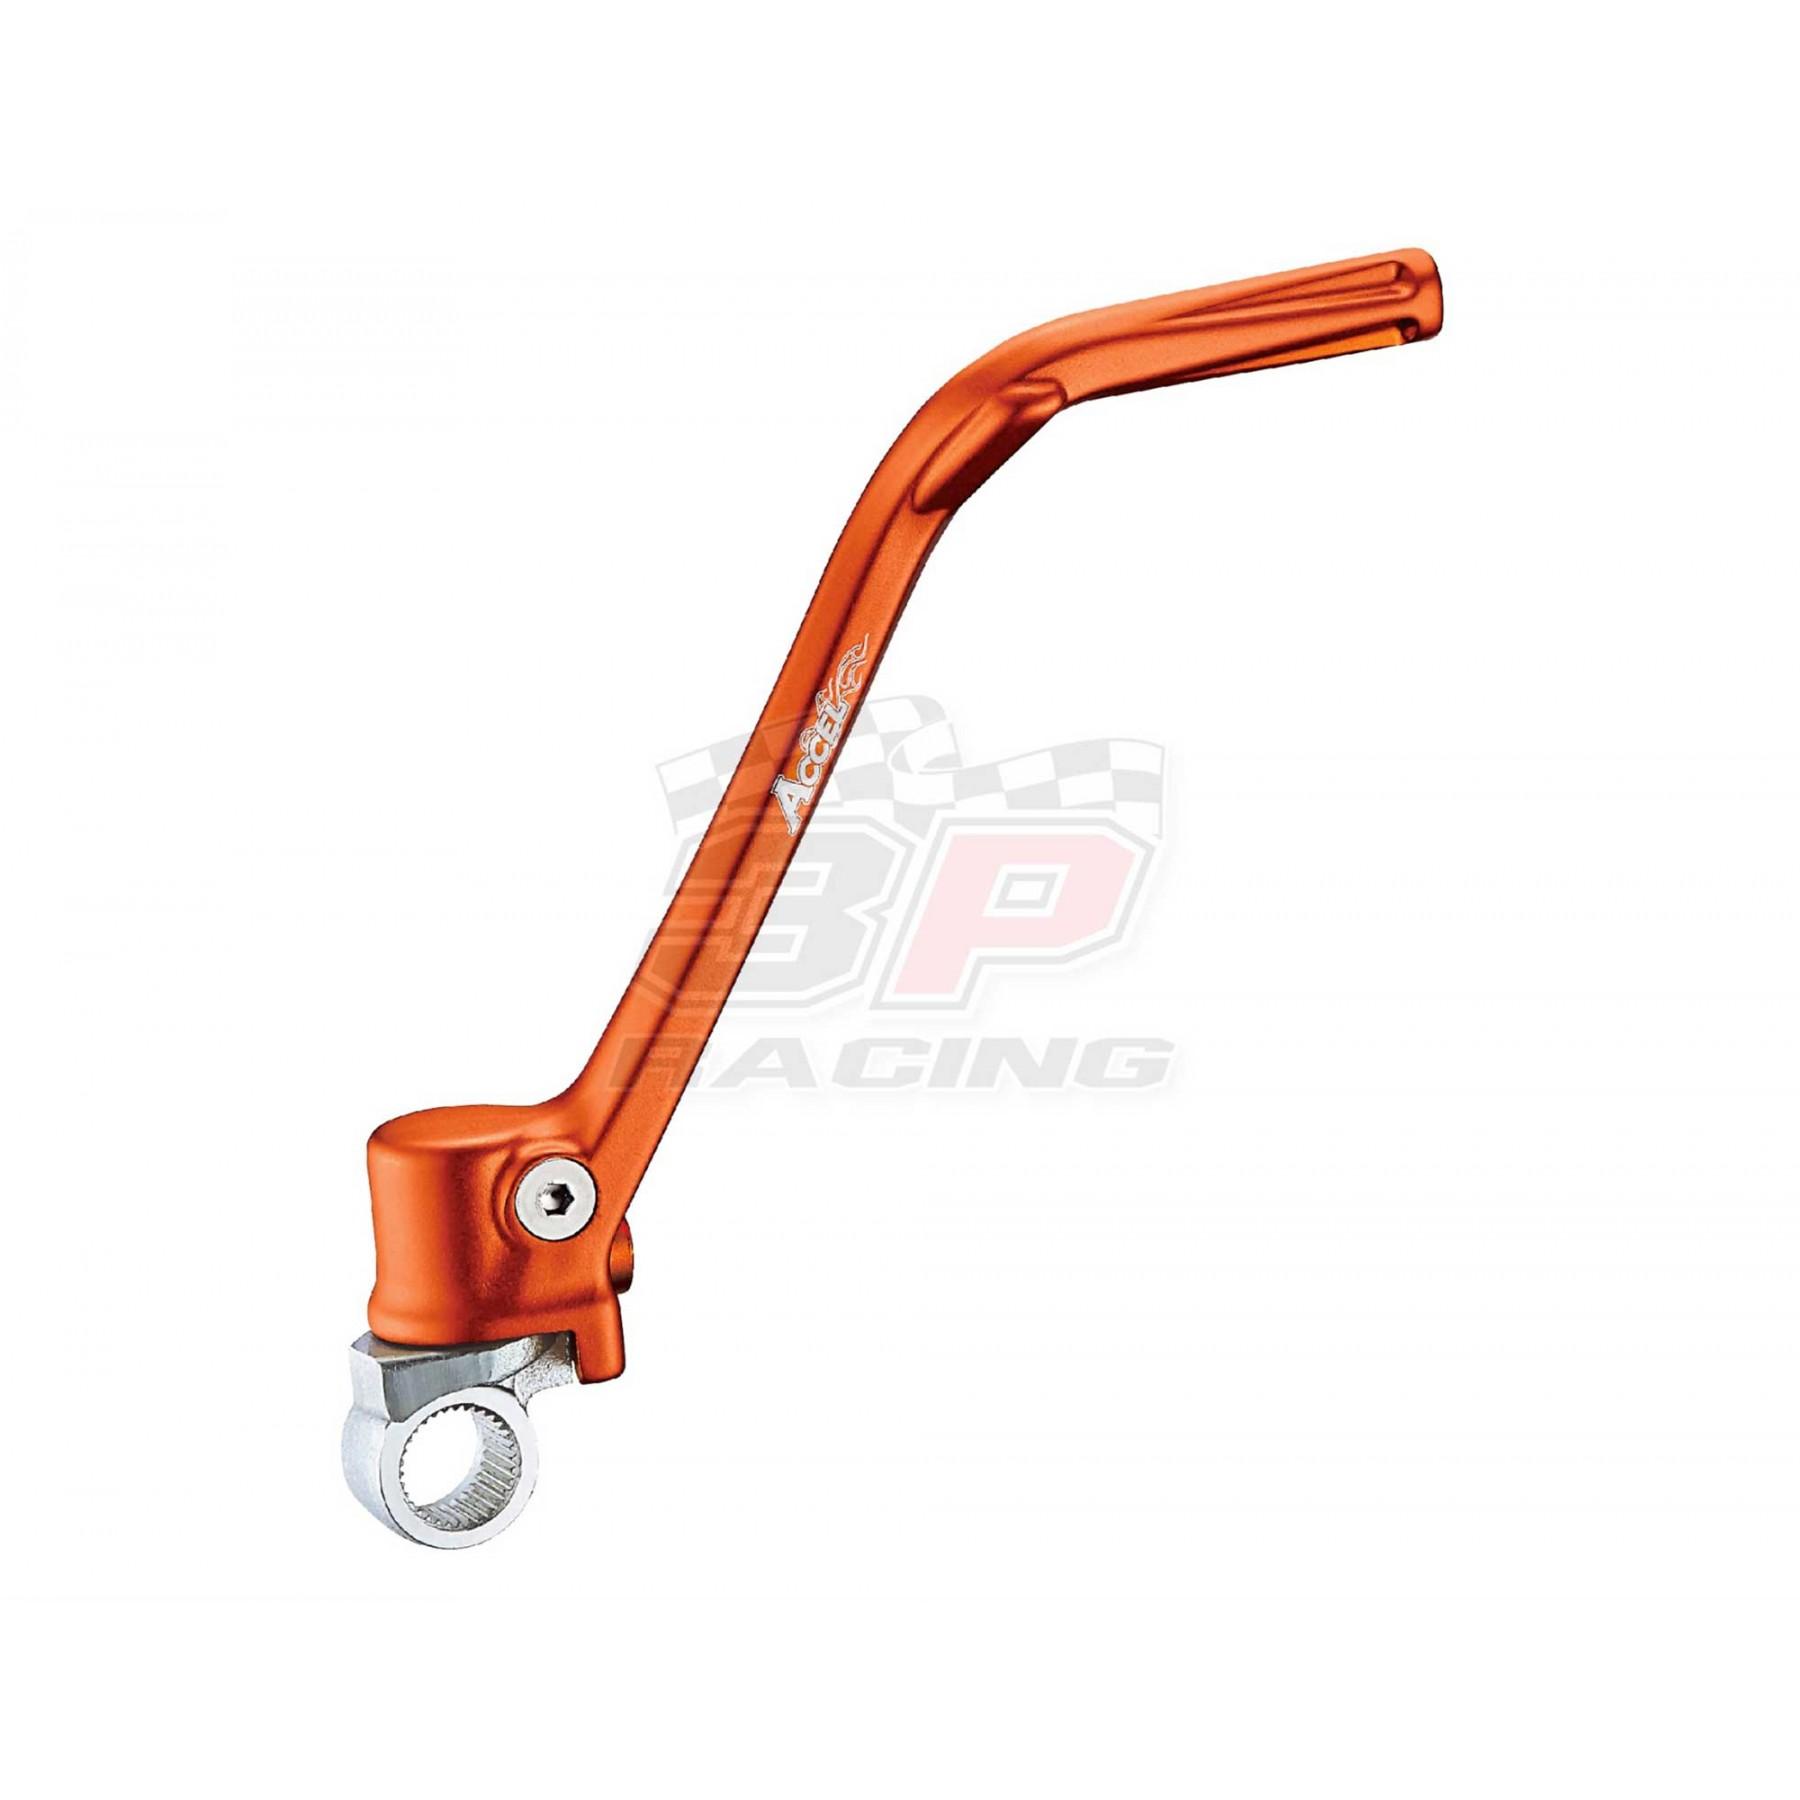 Accel high quality Forged Orange kick start crank lever AC-KST-502-OR for KTM SX125 SX150 2012-2015, EXC125 EXC200 2012-2016, Husaberg Husqvarna TE125 2012 2013 2014 2015 2016, TC125 2014 2015. Kickstarter crank replacement of KTM OEM part 50333070244.